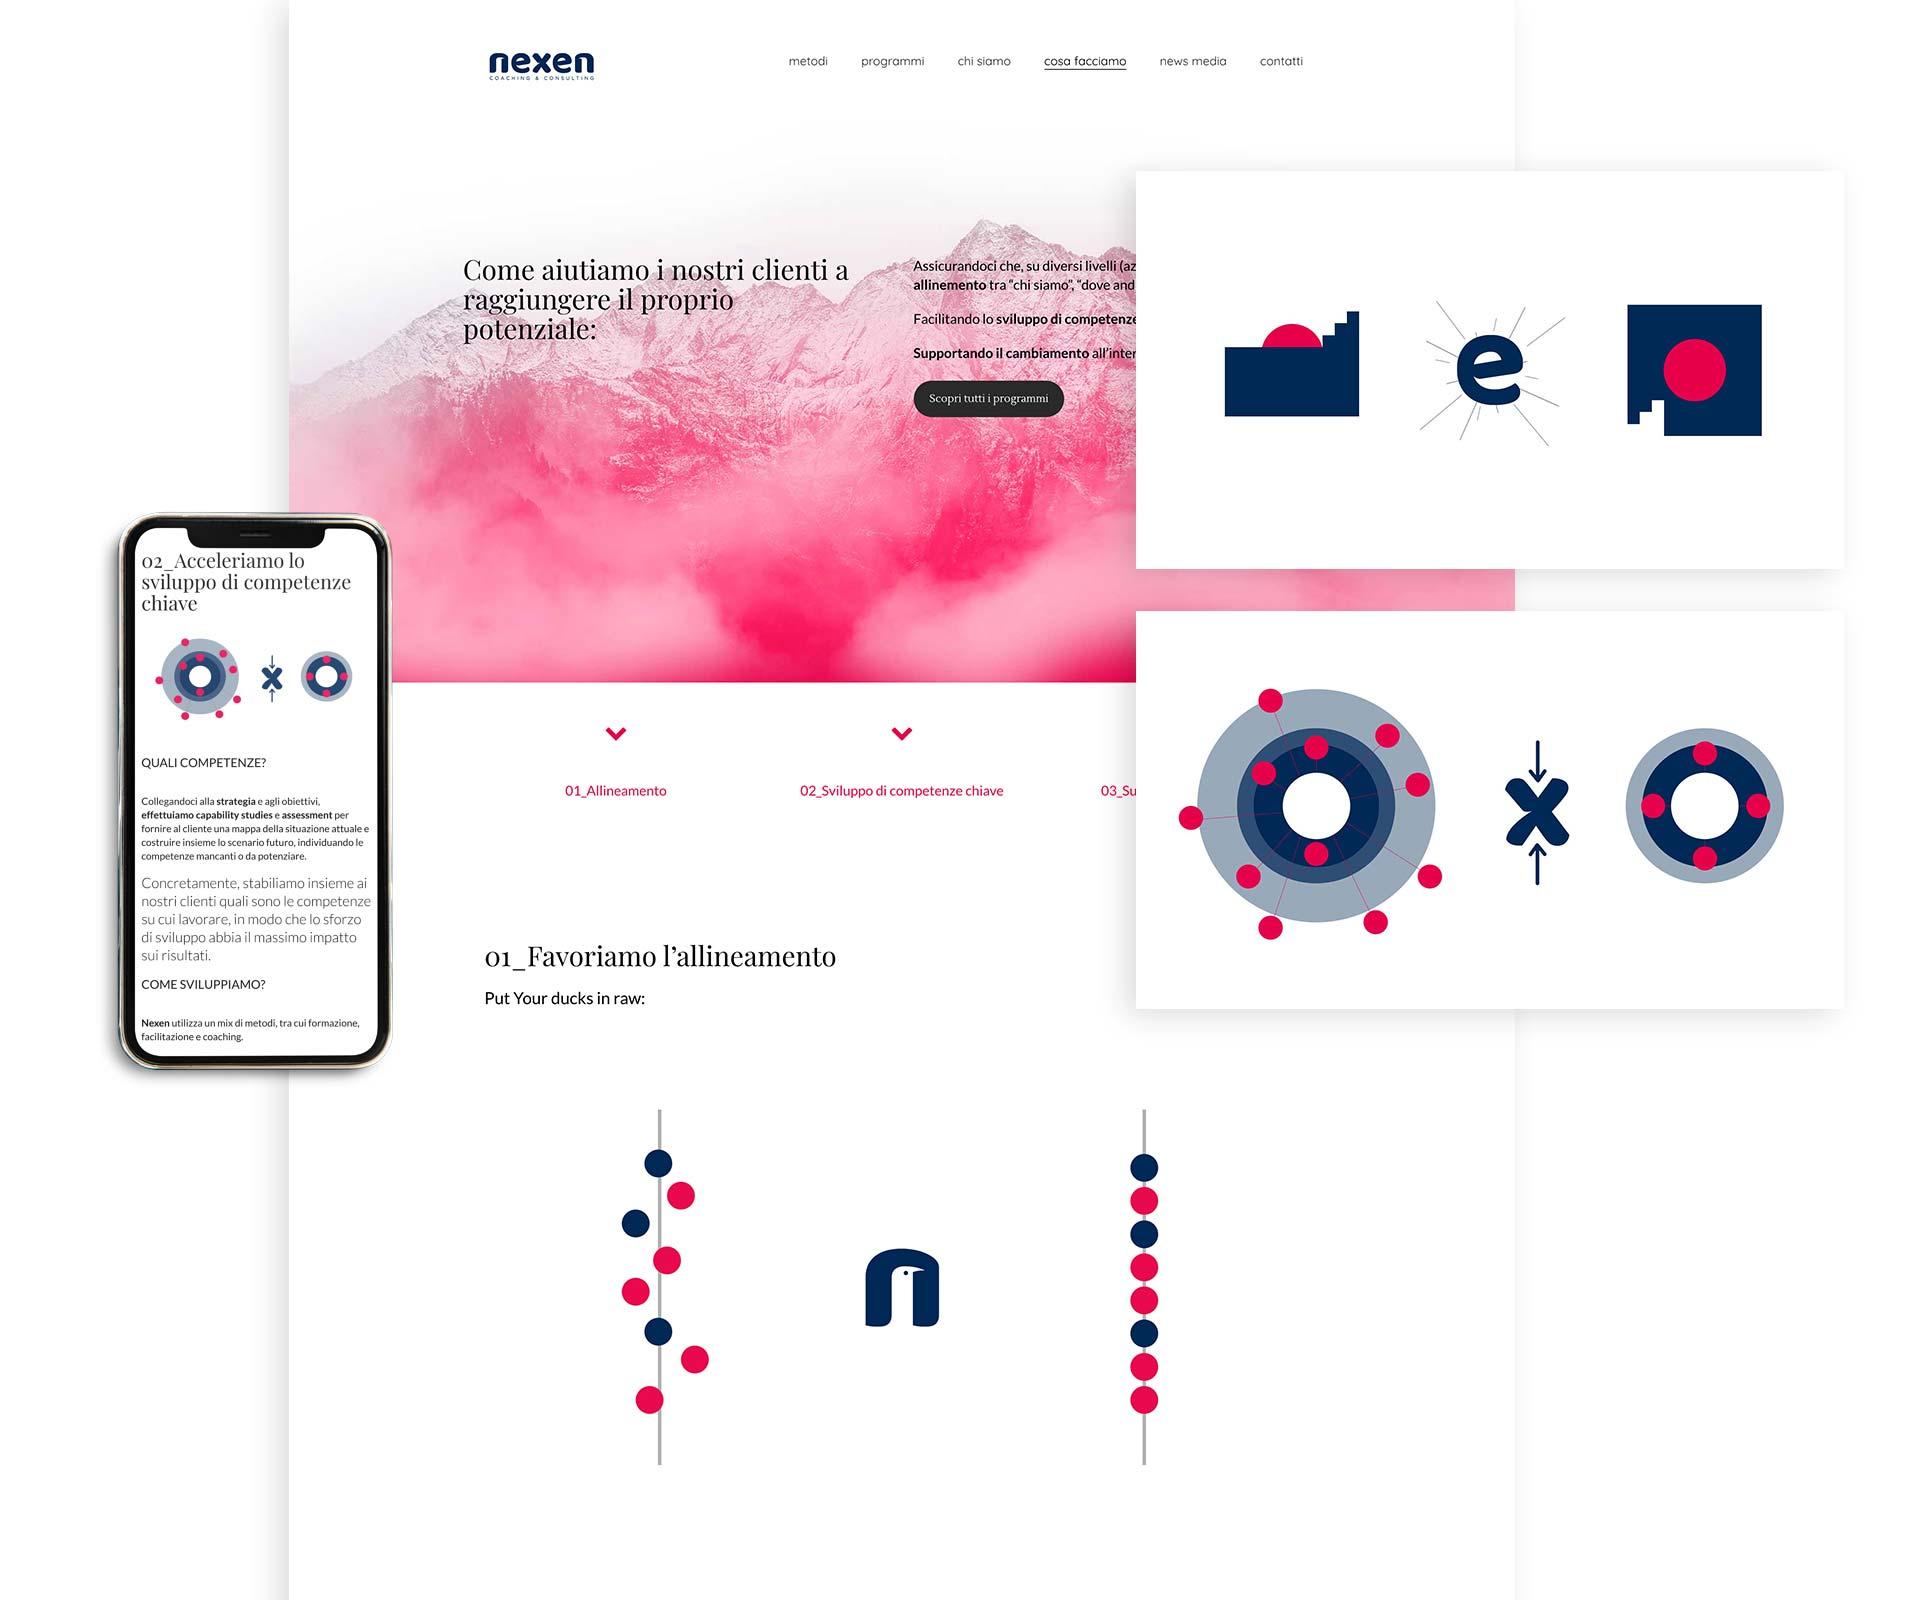 05 grafico milano nexenpartners color fonts